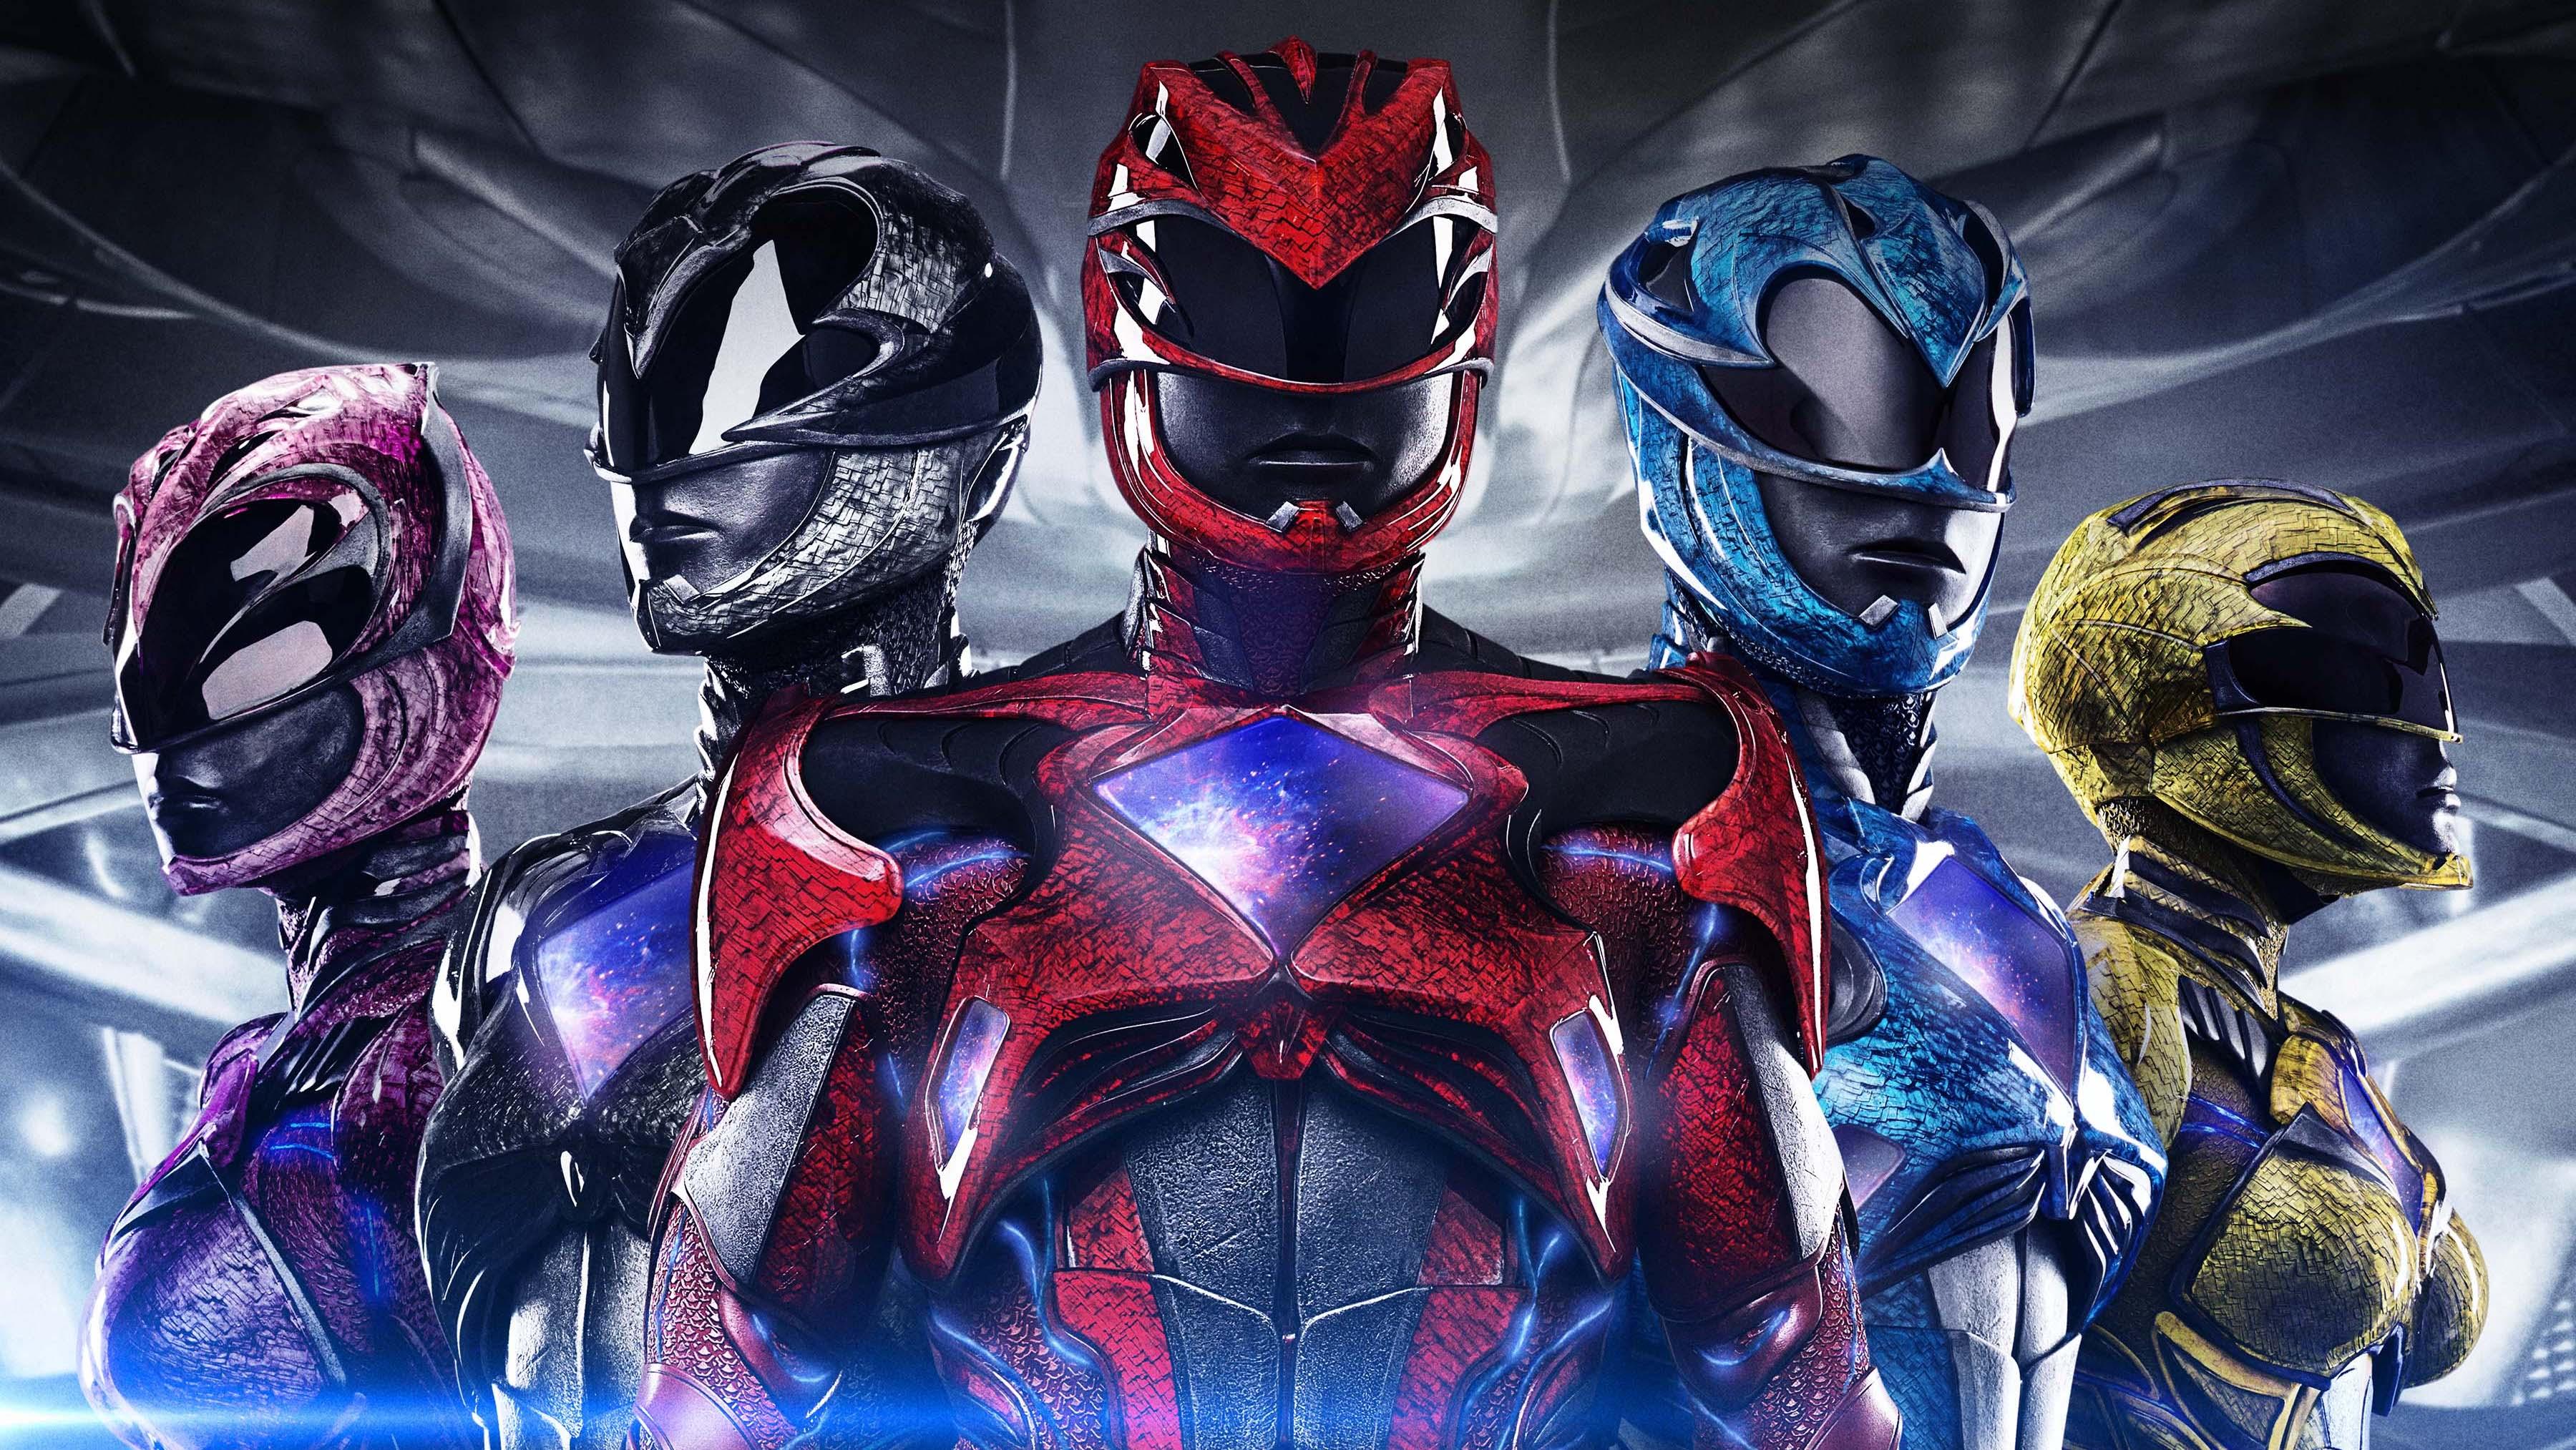 Power Rangers International Poster F